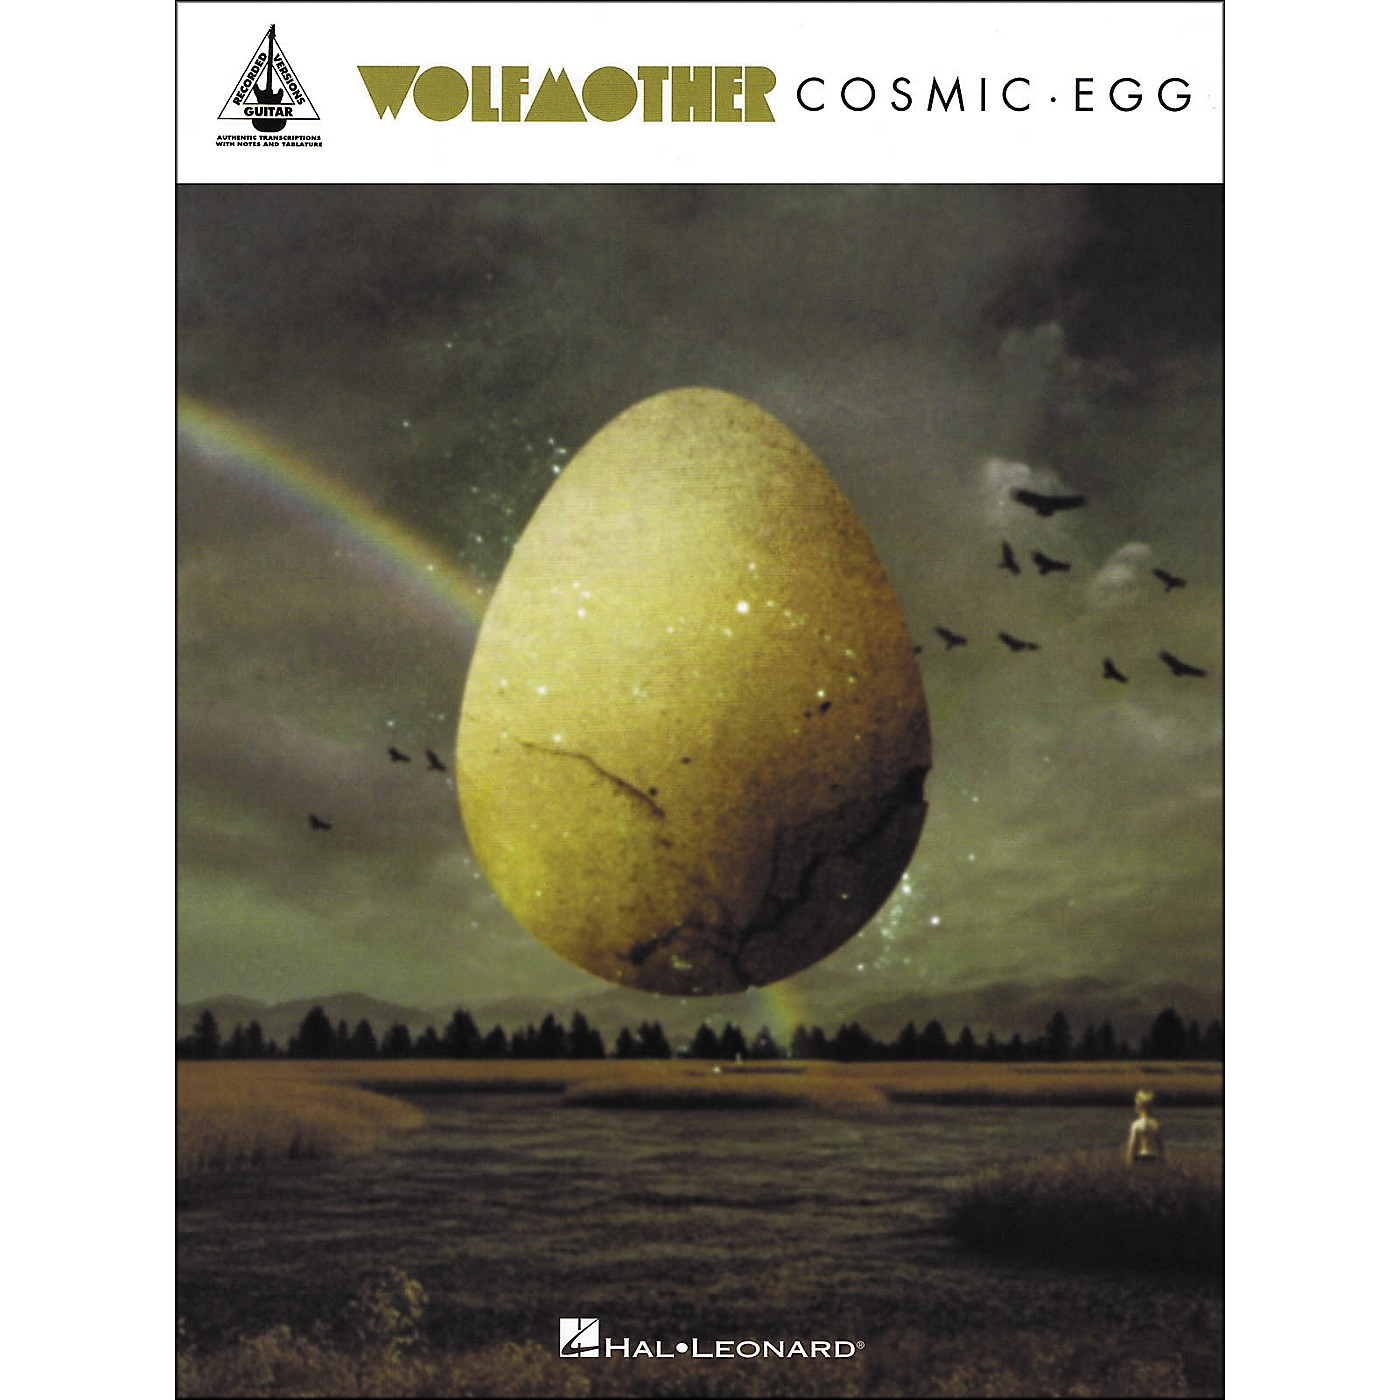 Hal Leonard Wolfmother - Cosmic Egg Tab Book thumbnail